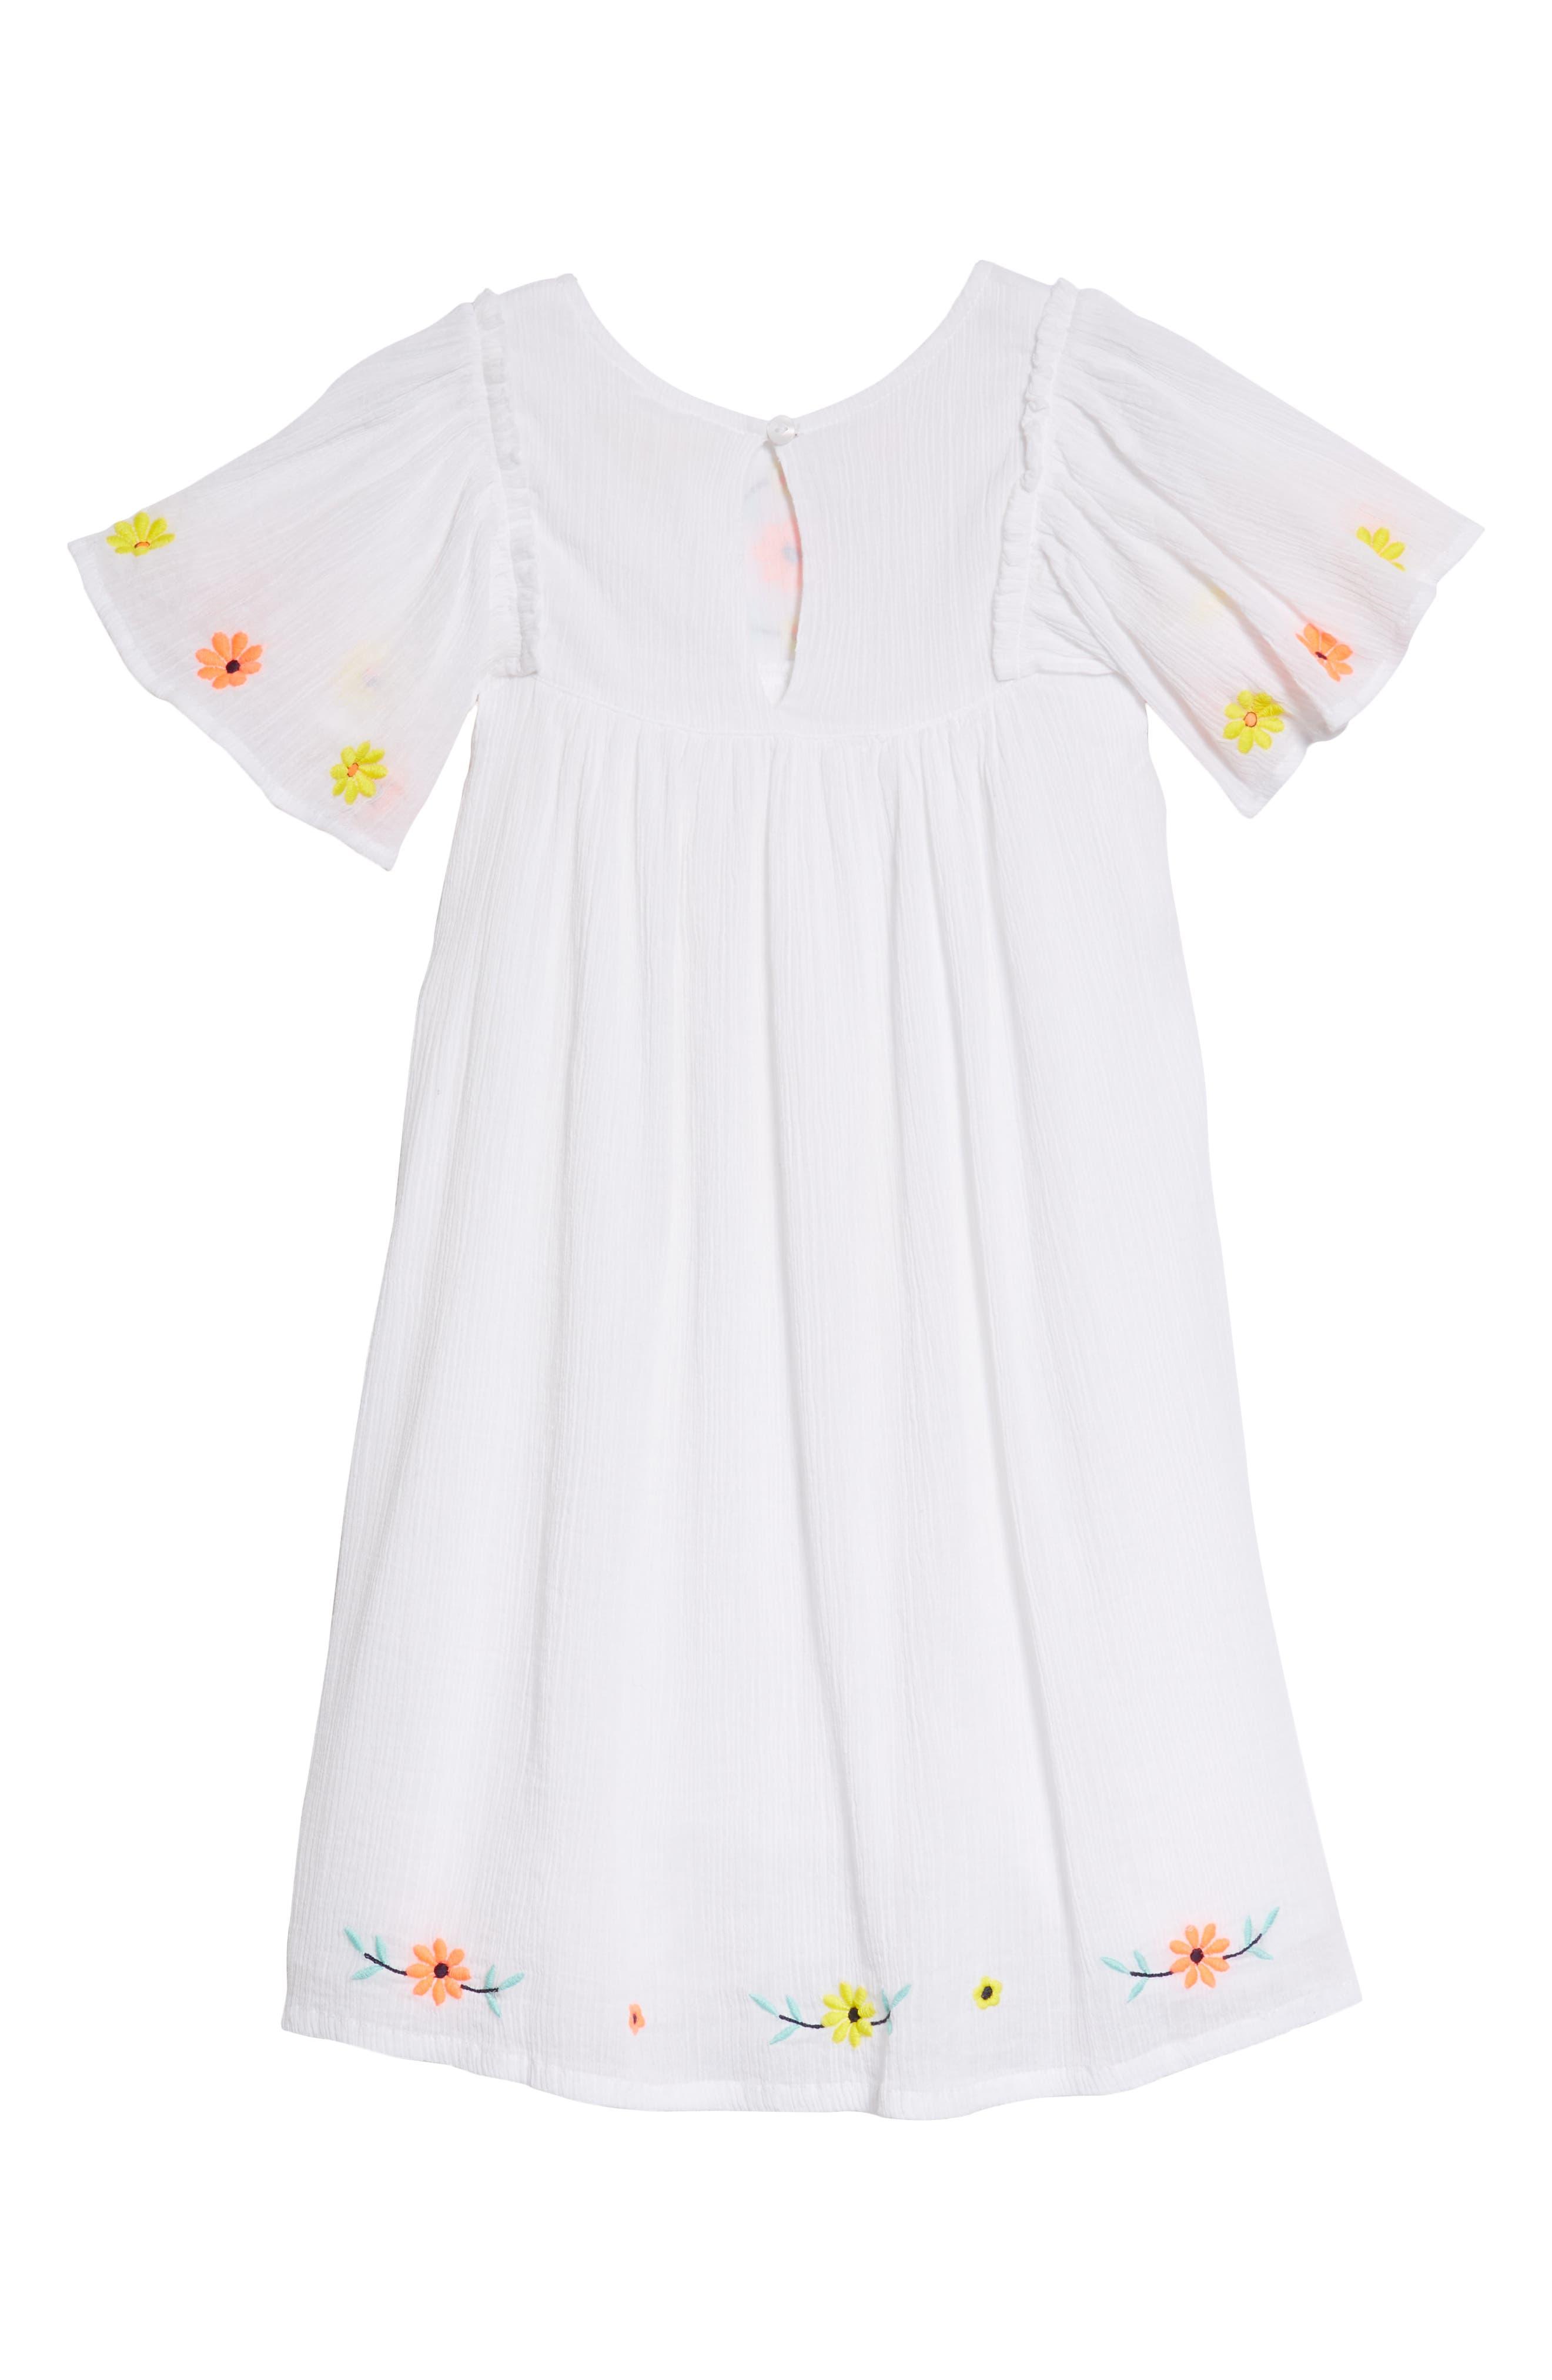 Embroidered Flutter Sleeve Dress,                             Alternate thumbnail 2, color,                             White